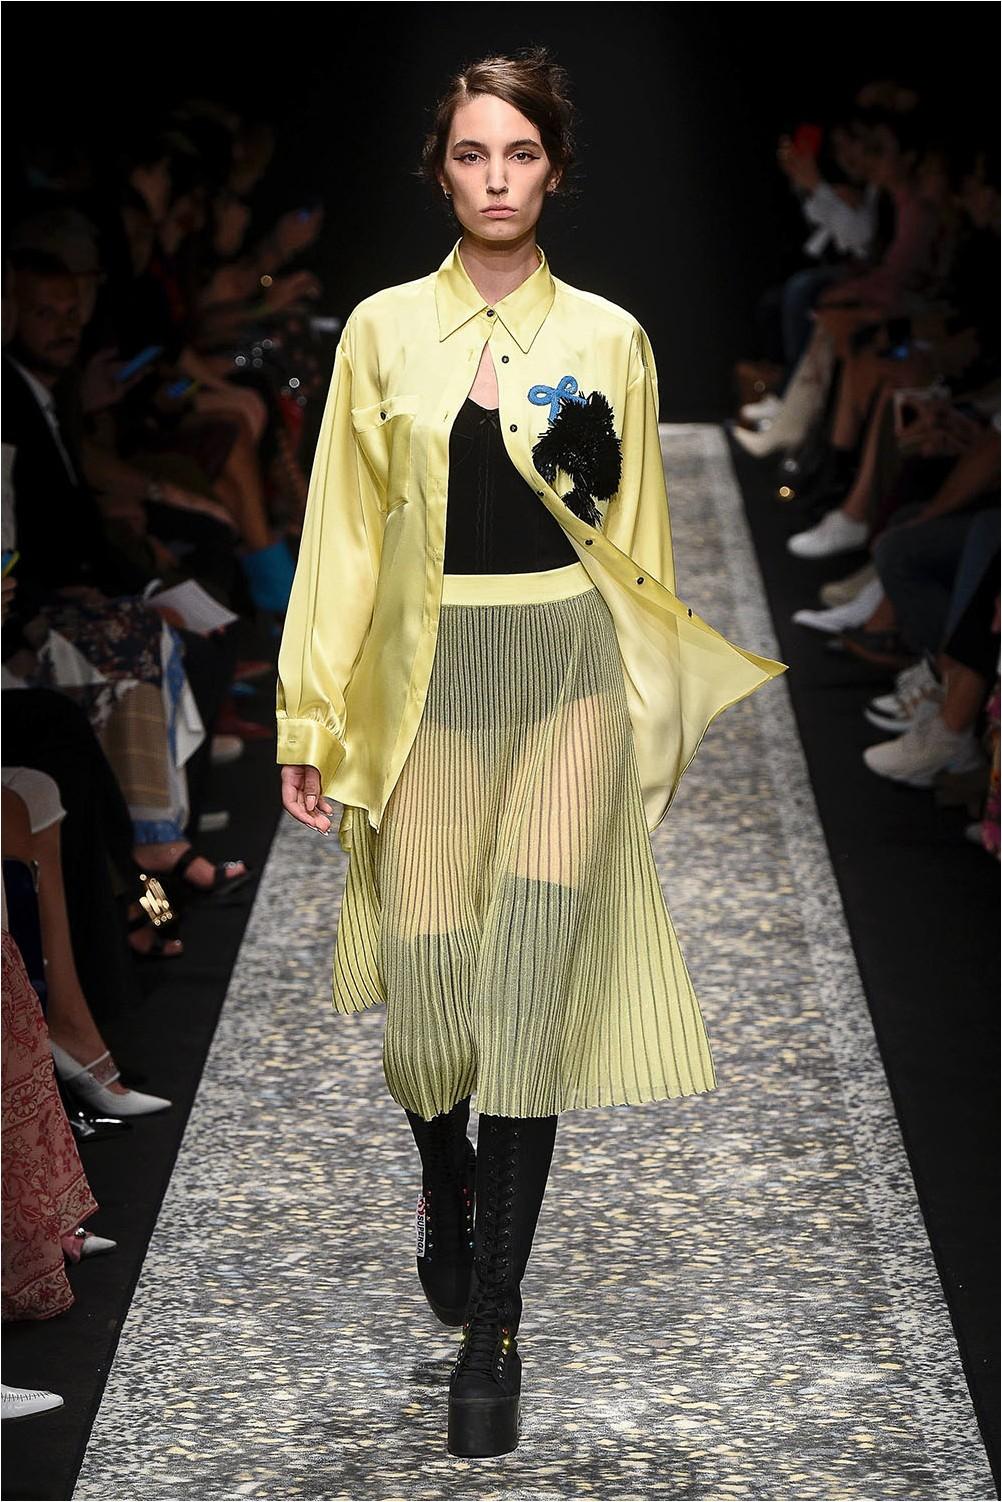 Sheer skirt Marco de Vincenzo